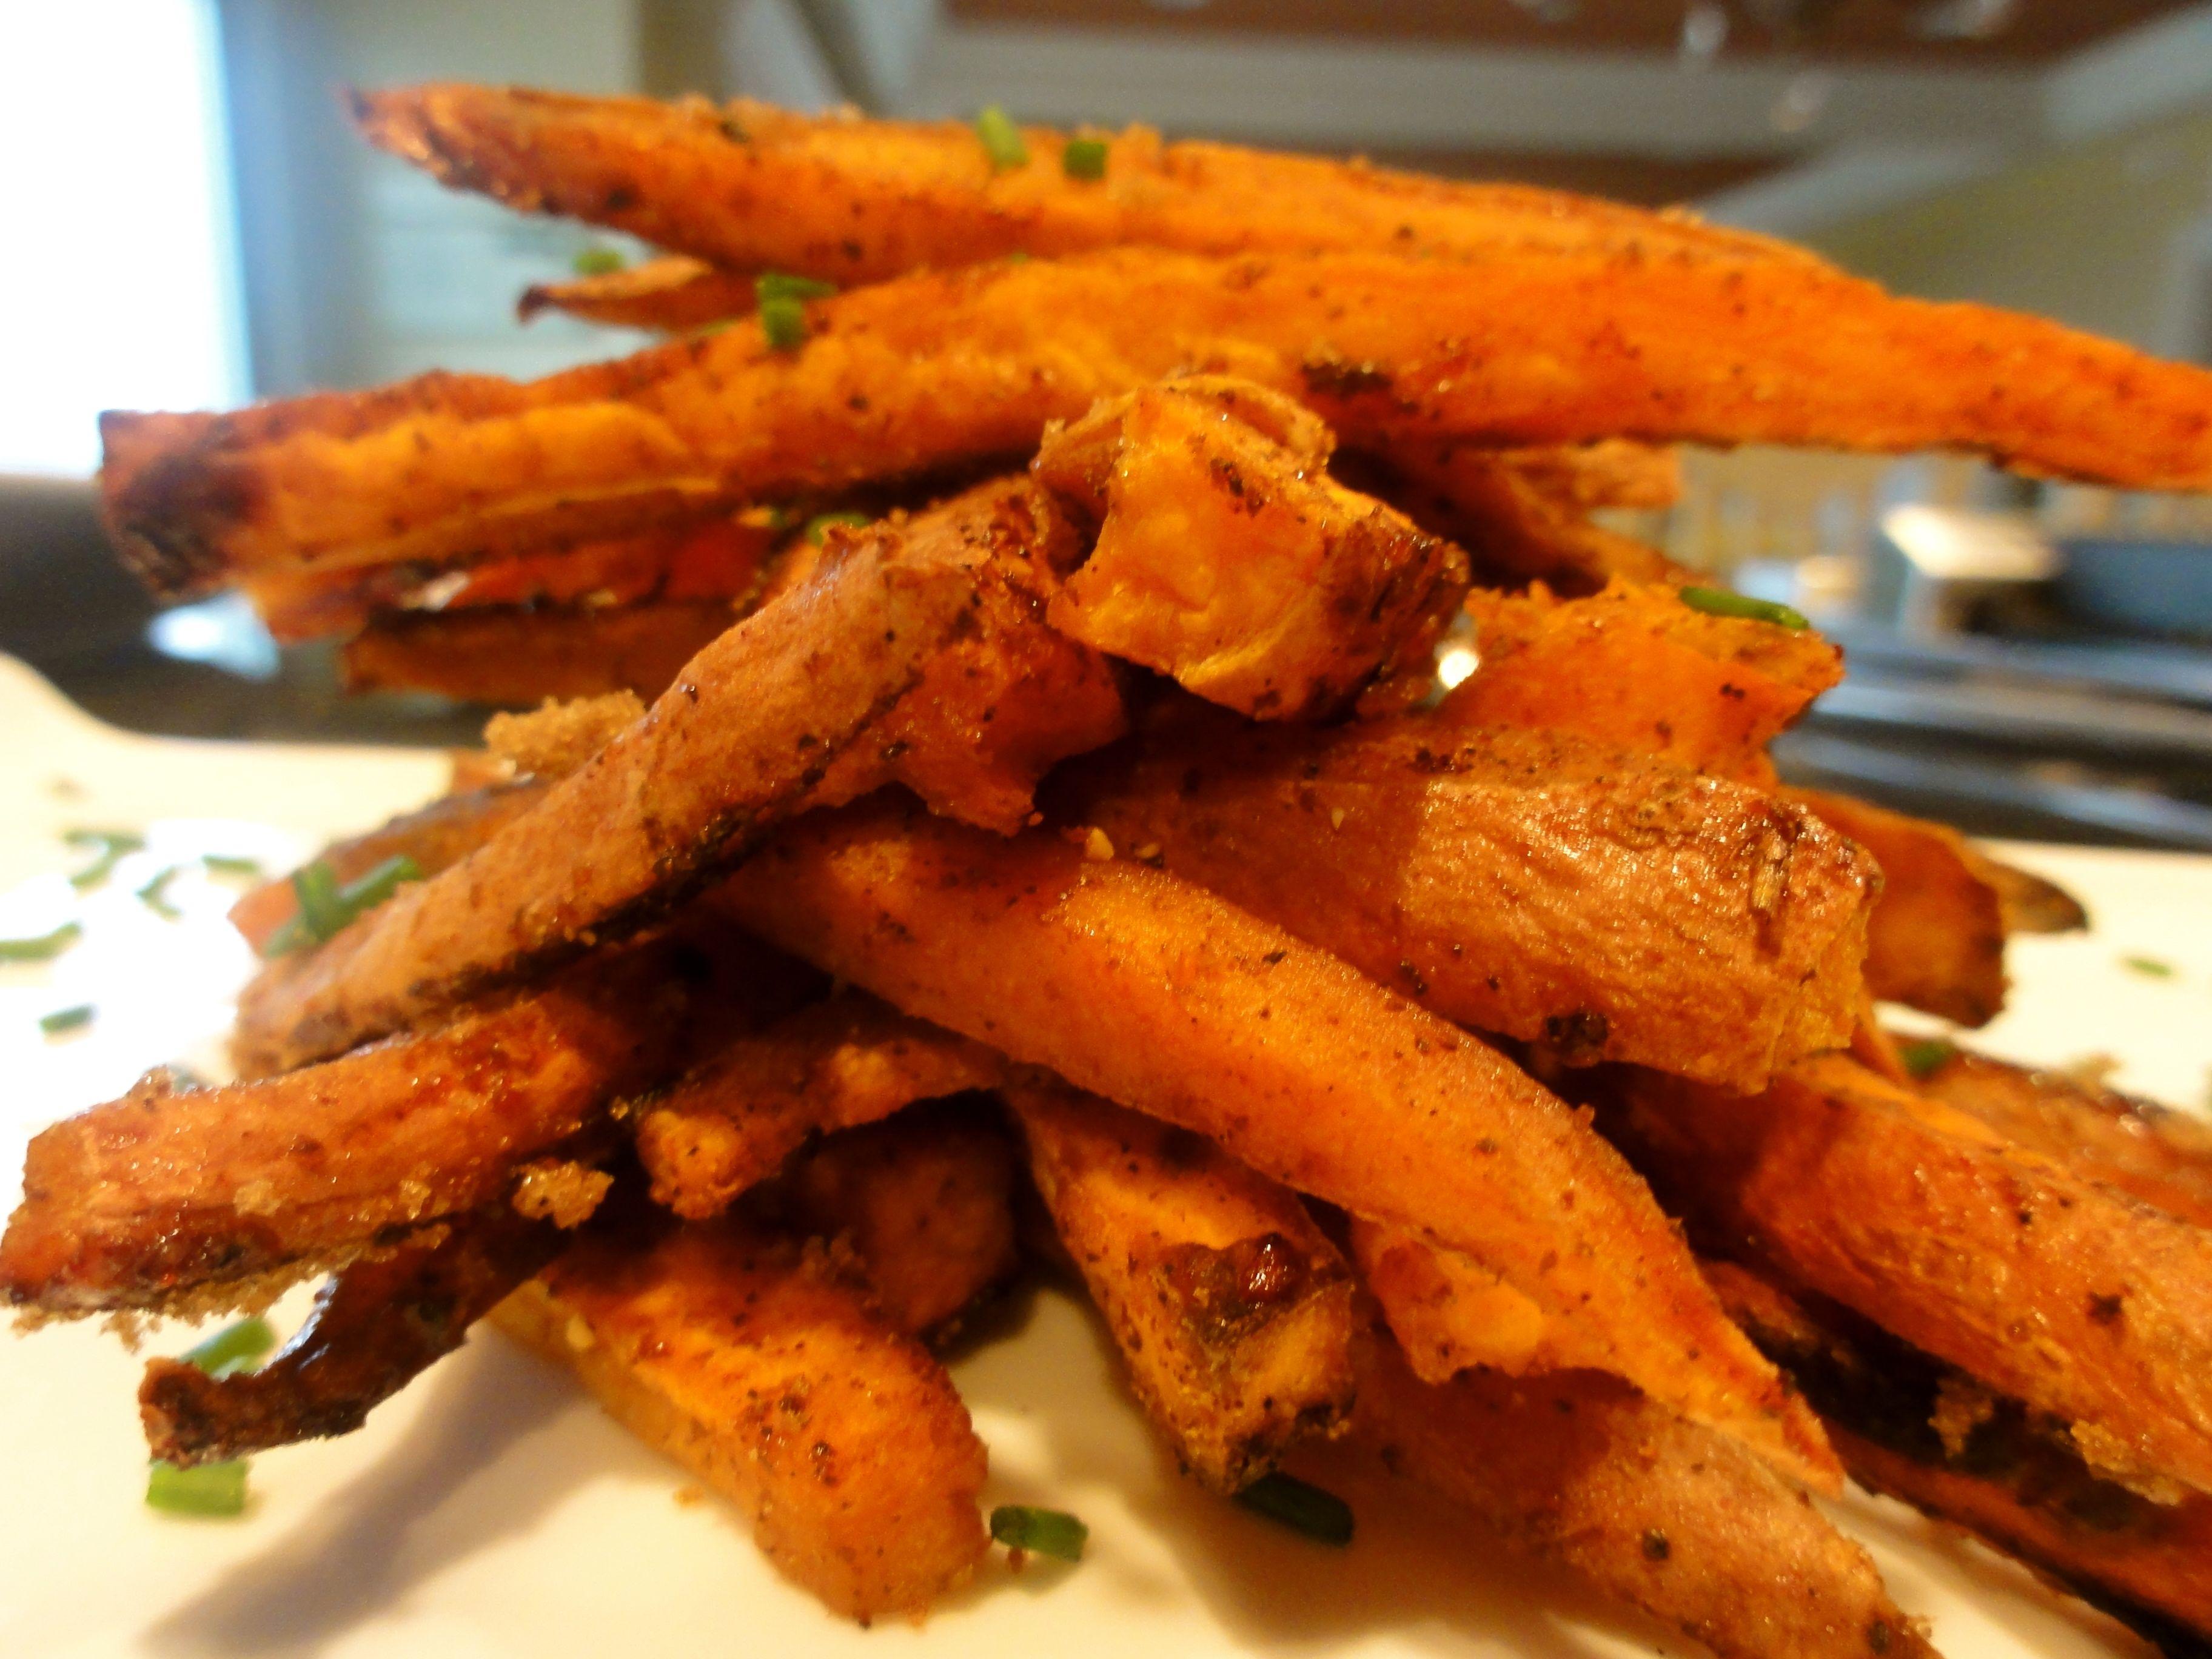 Baked Sweet & Spicy Sweet Potato Fries | Chef Priyanka